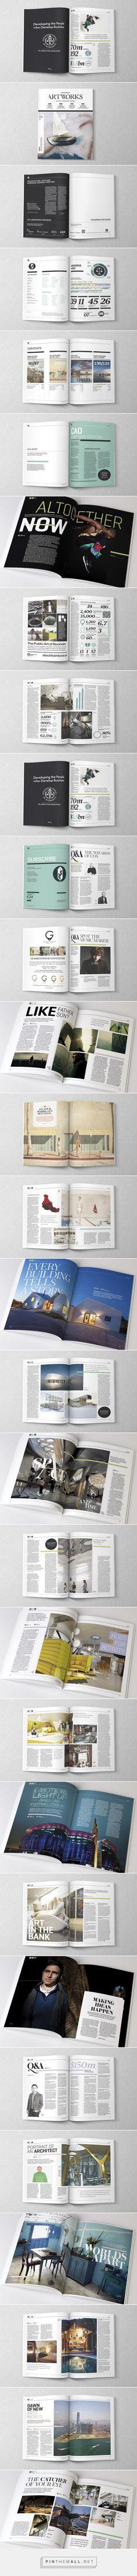 Magazine Design Inspiration - Artworks Journal Issue 2